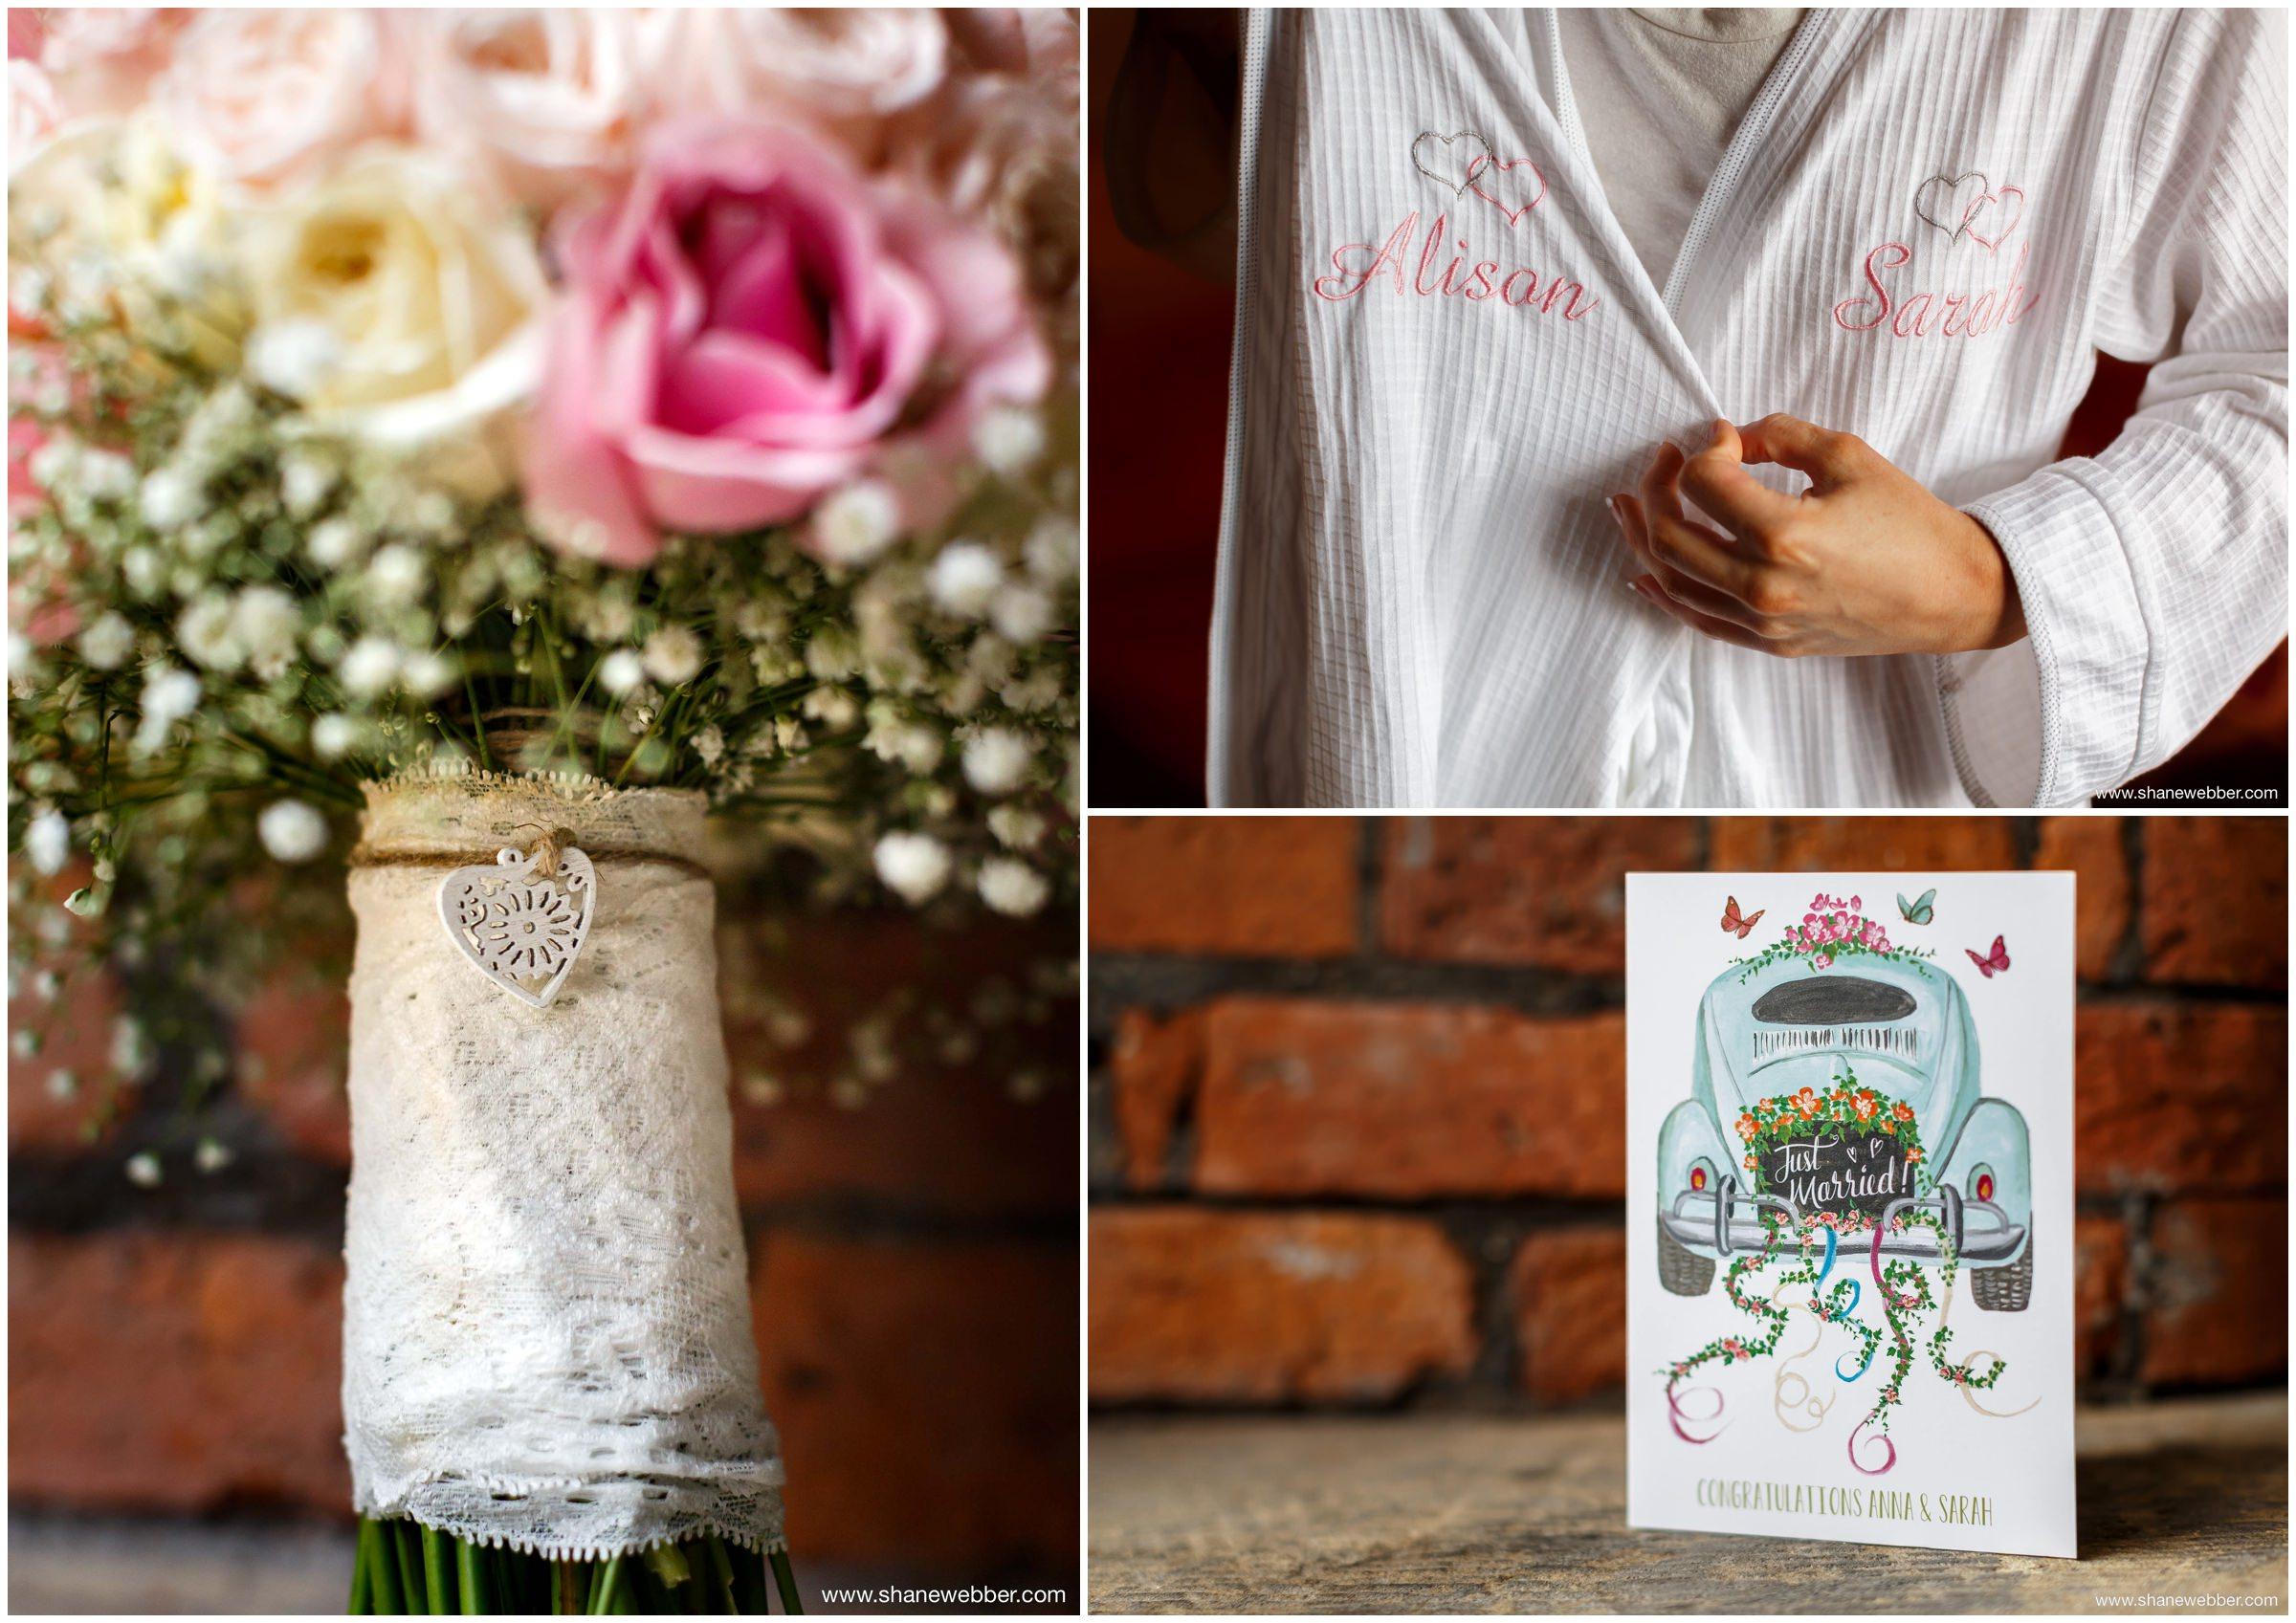 Cute wedding details for bridal preparation